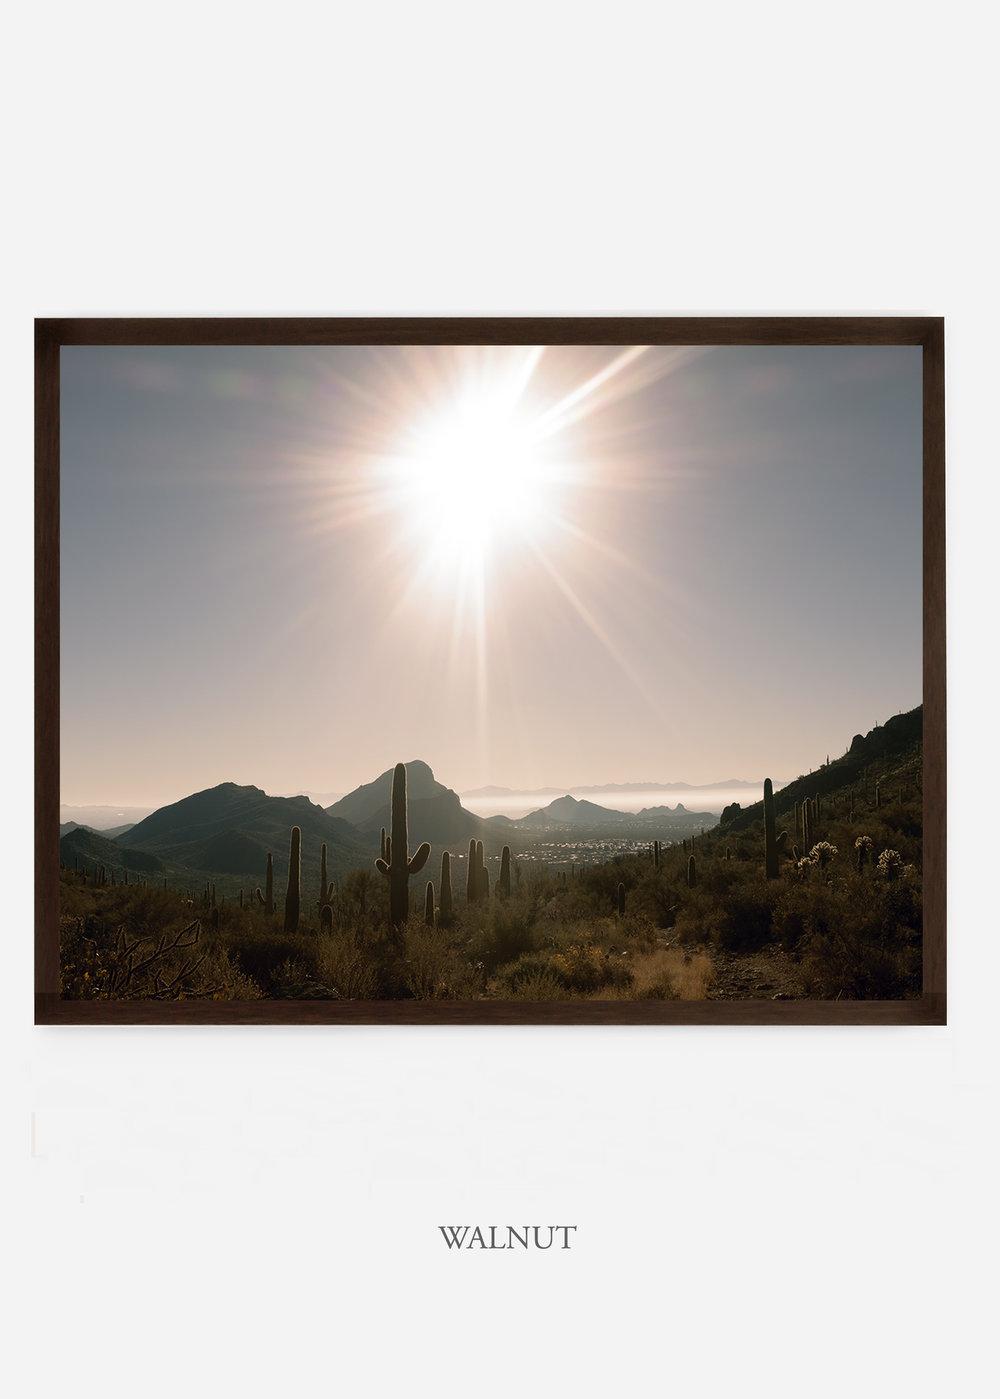 nomat_walnutframe-saguaroNo.15-wildercalifornia-art-wallart-cactusprint-homedecor-prints-arizona-botanical-artwork-interiordesign.jpg